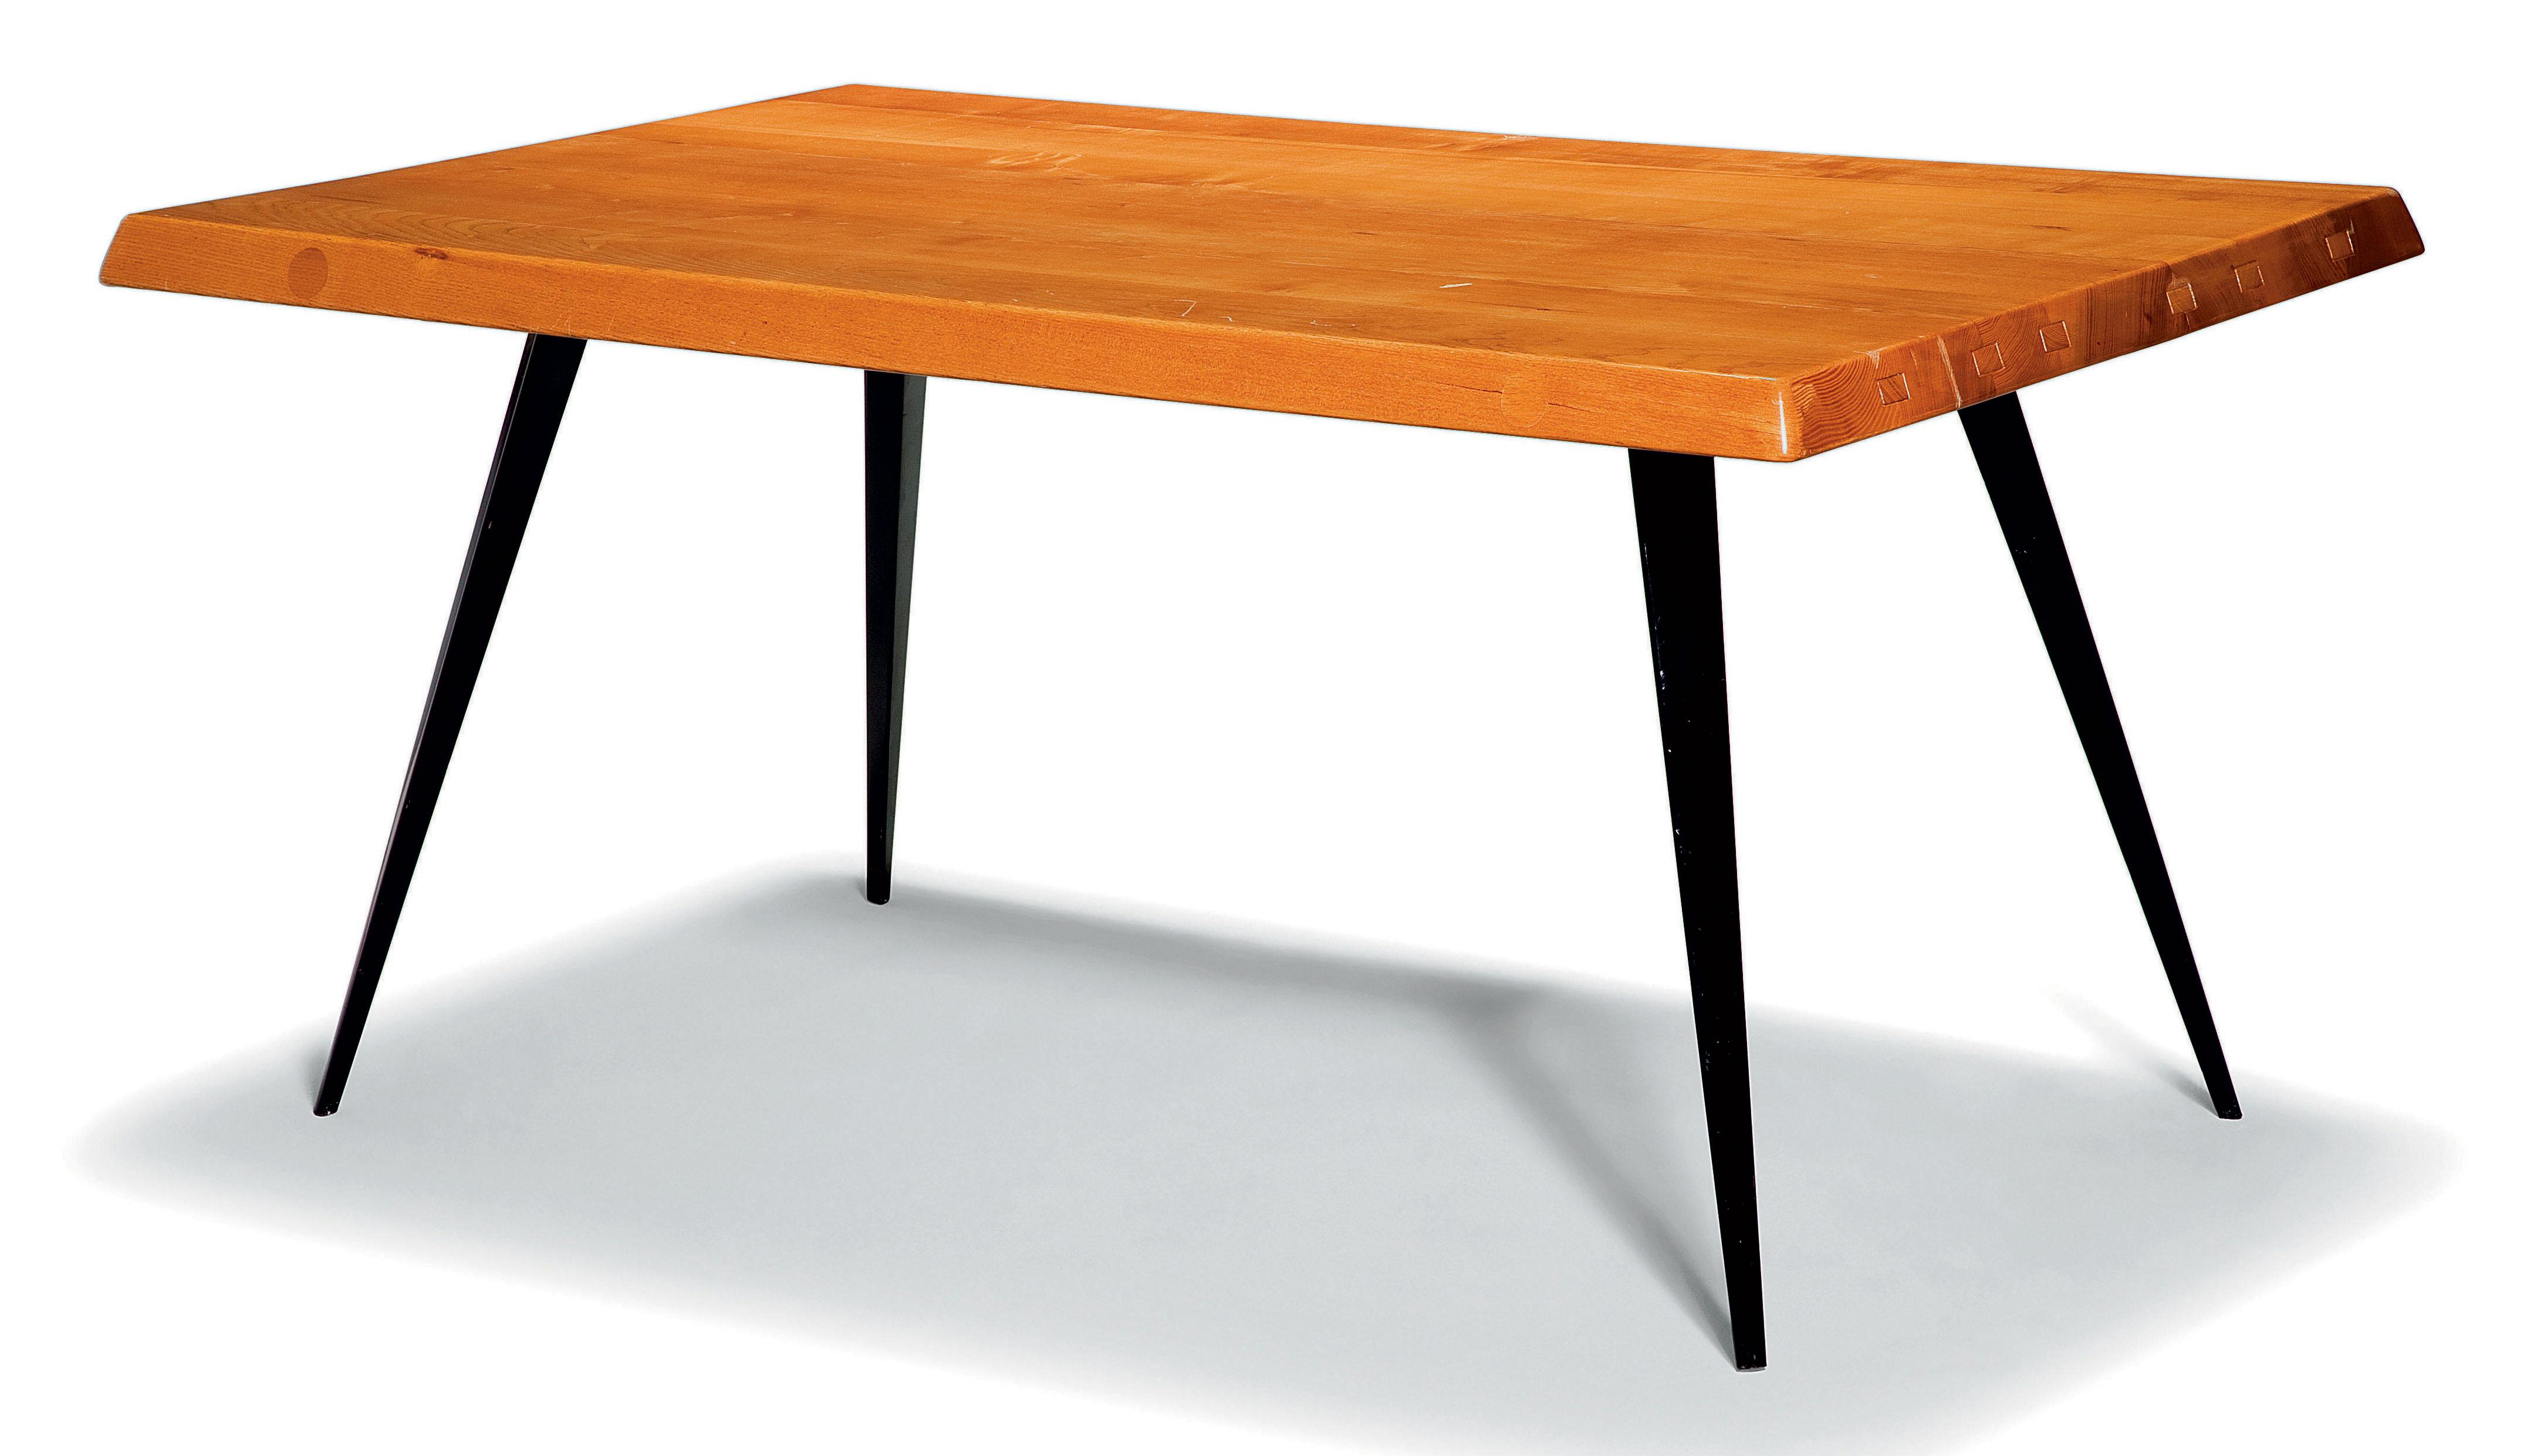 Charlotte perriand 1903 1999 et jean prouve 1901 1984 table de salle a manger edition - Salle de bain charlotte perriand ...